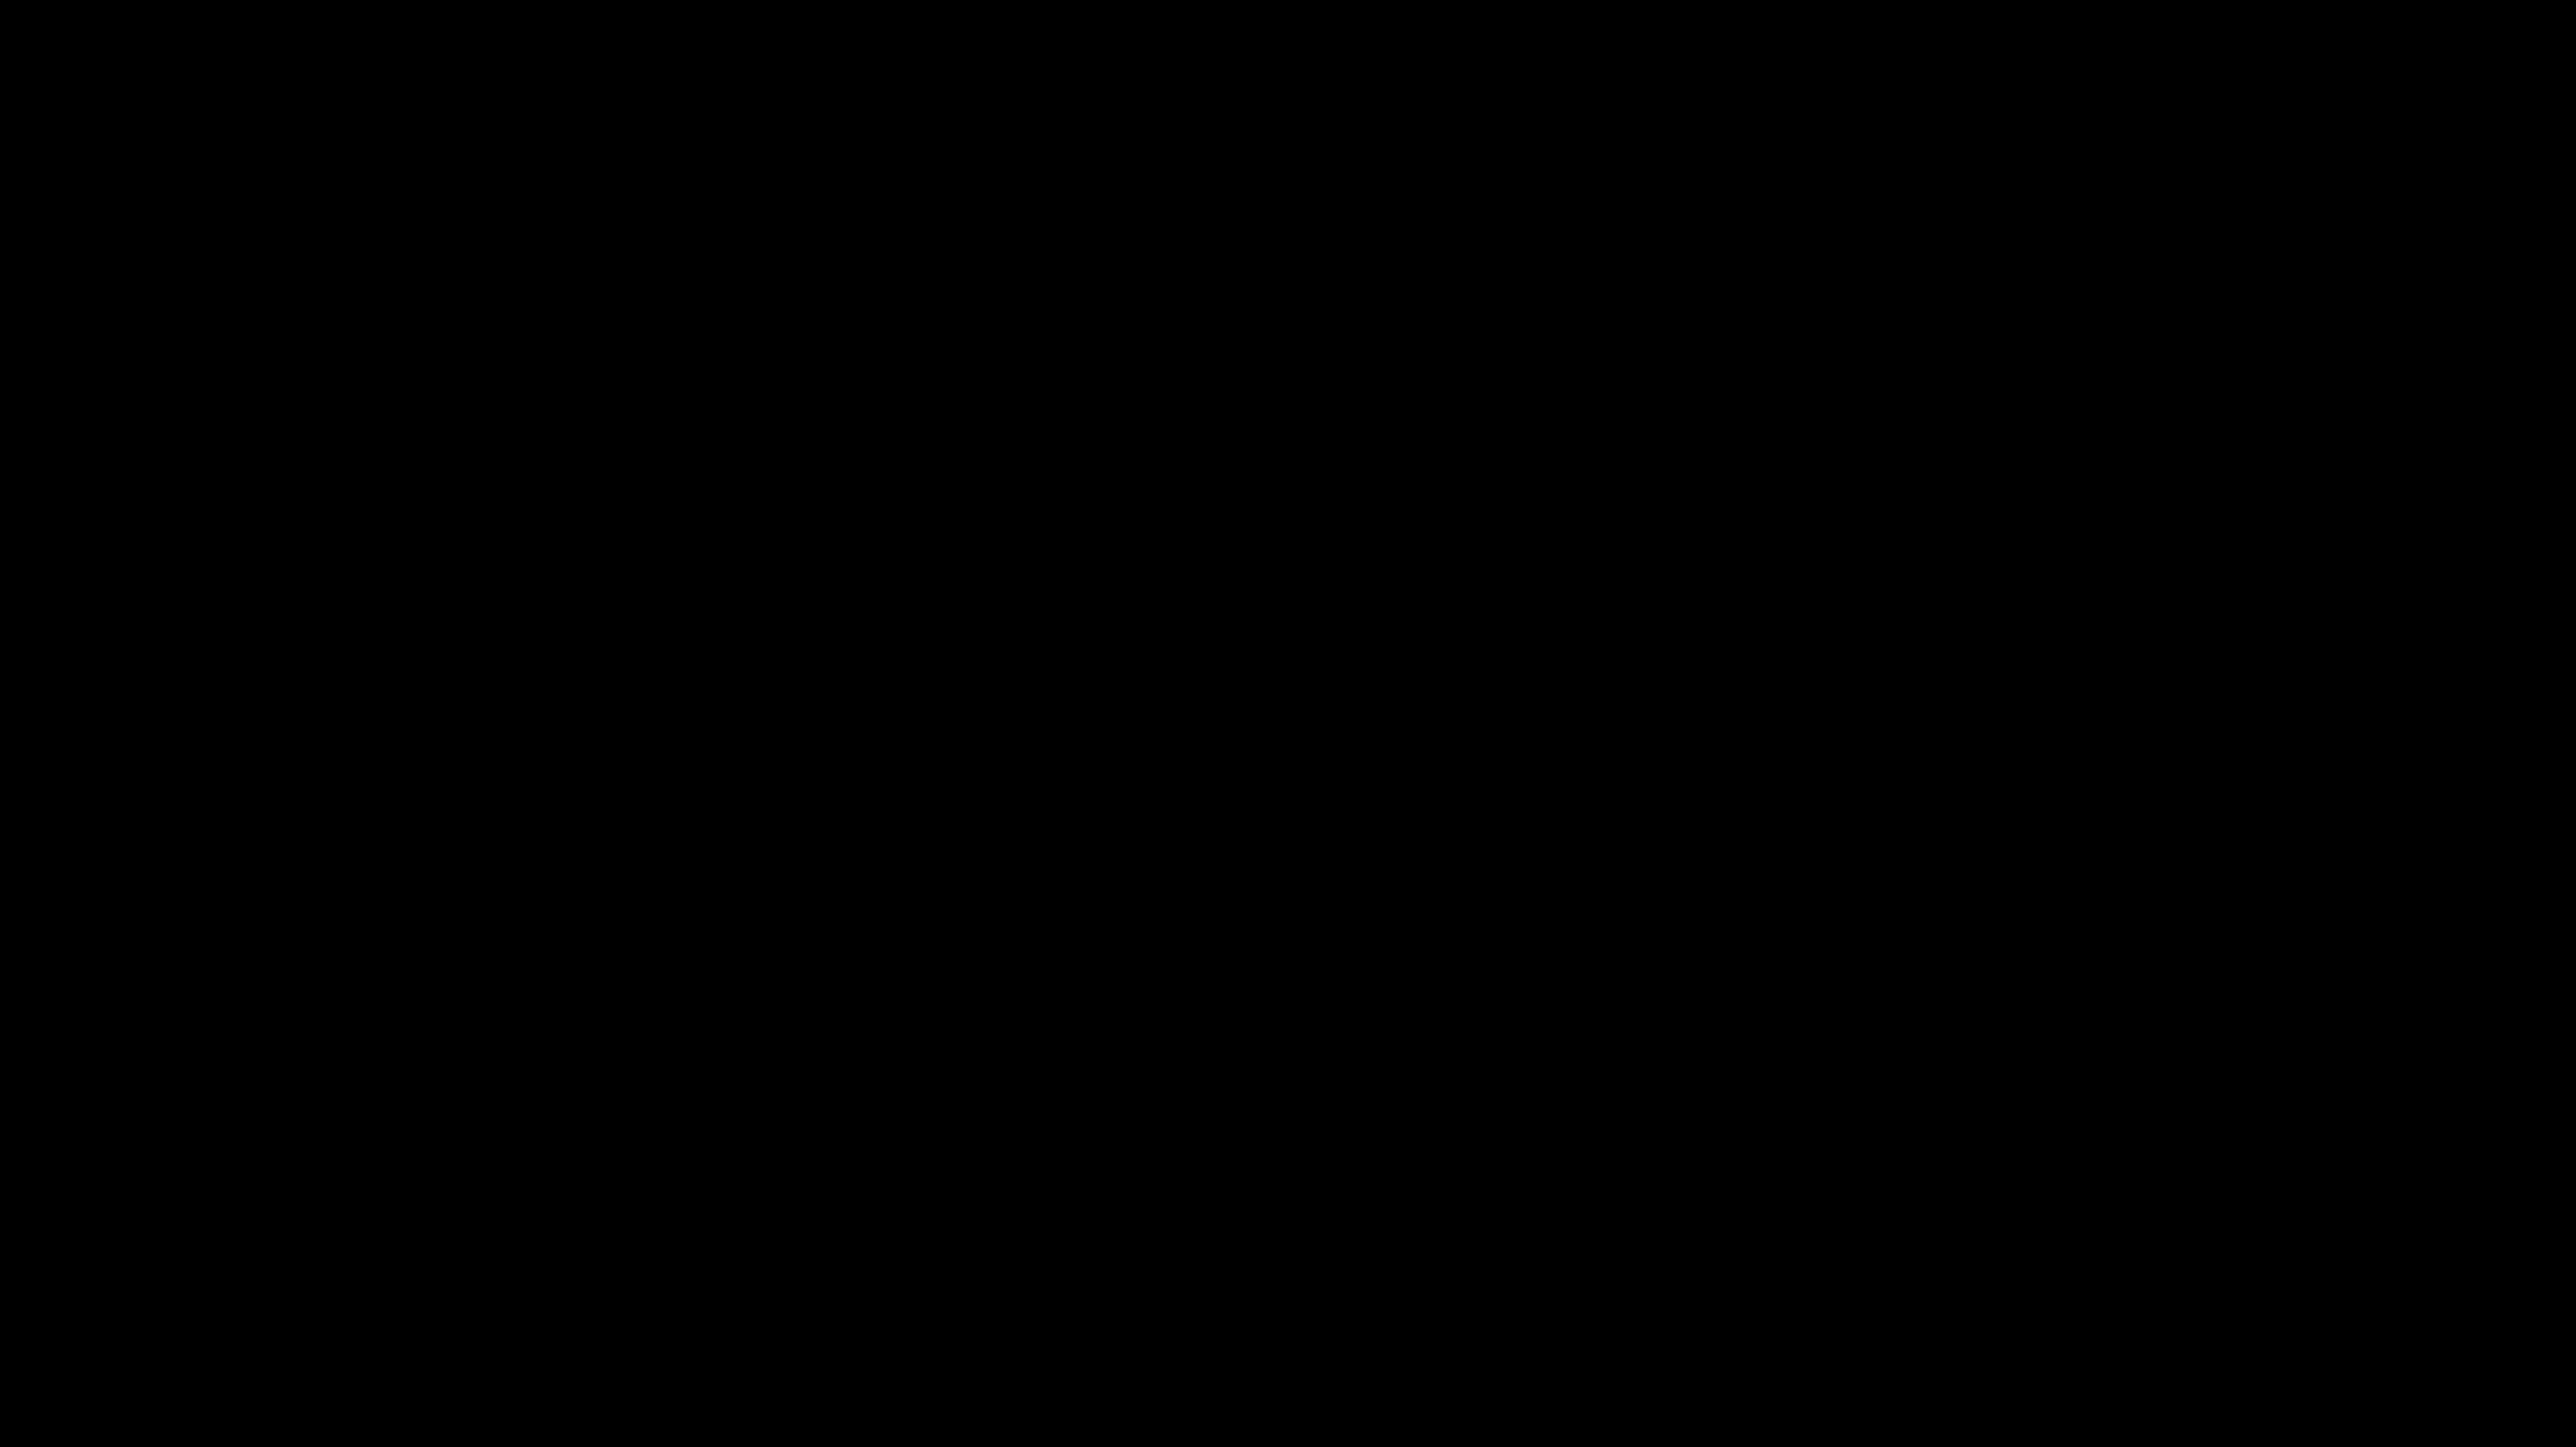 Canta Rainette - Logo noir